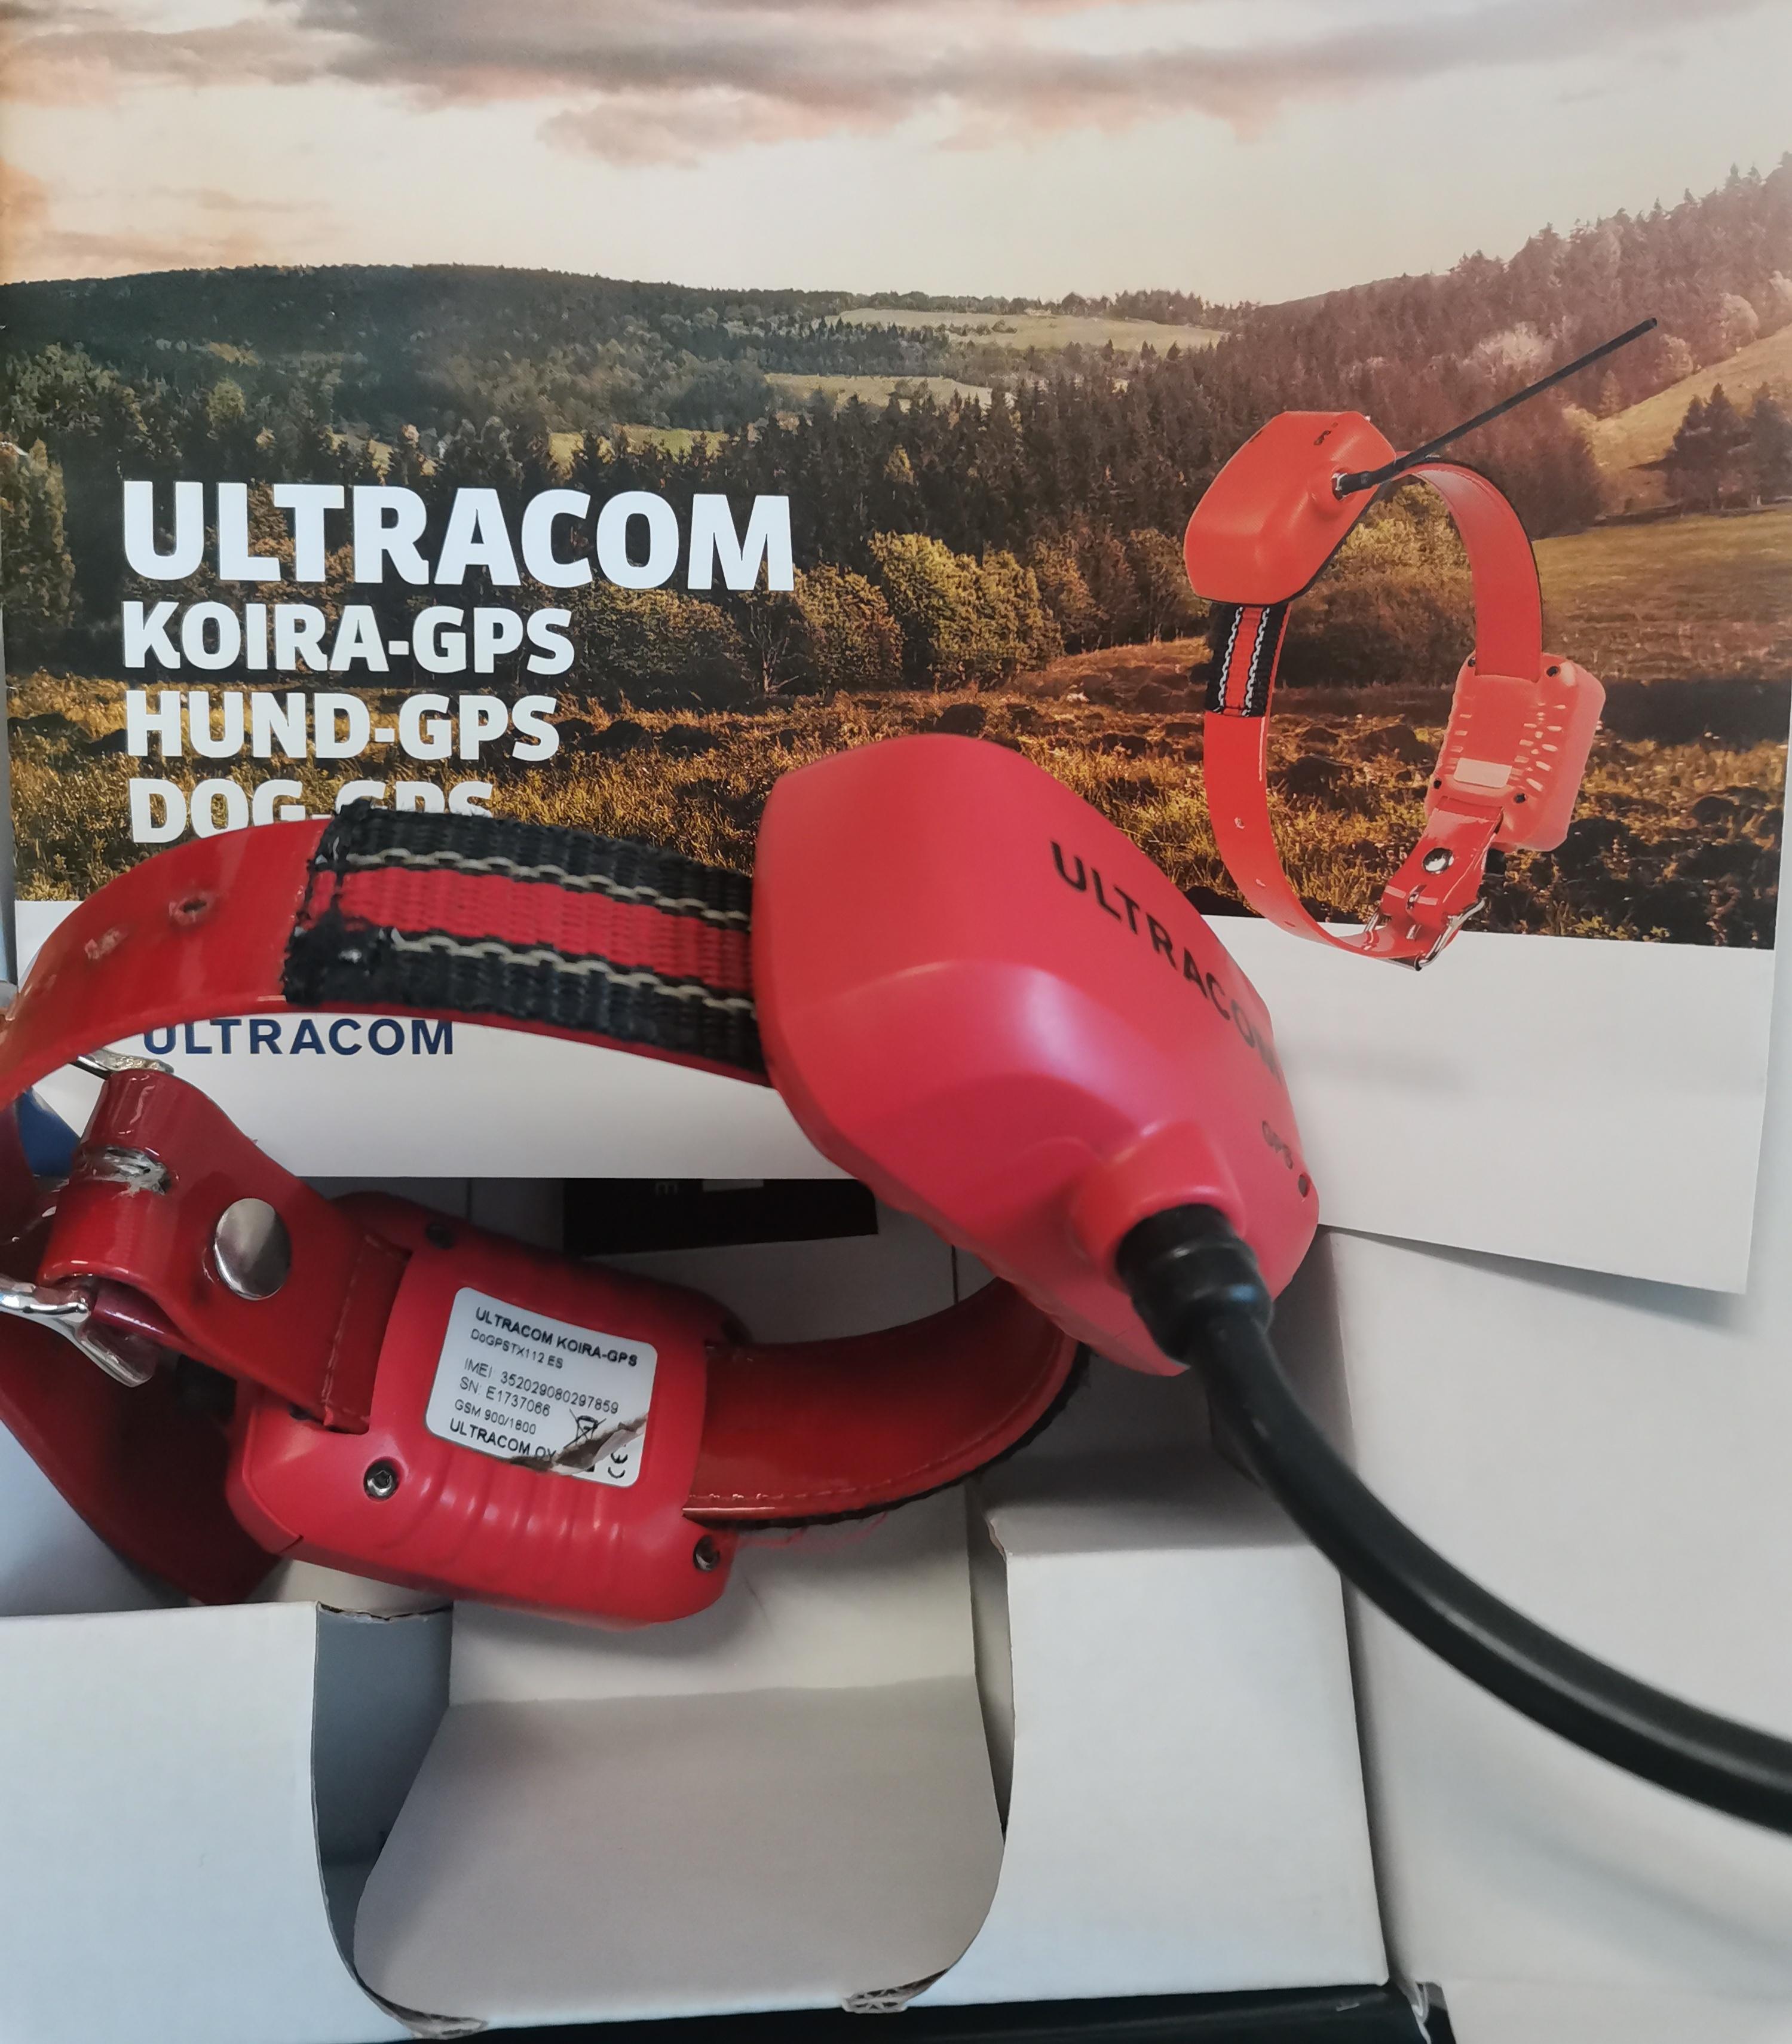 Ultracom koira-gps lyhyt 2-akun, käytetty